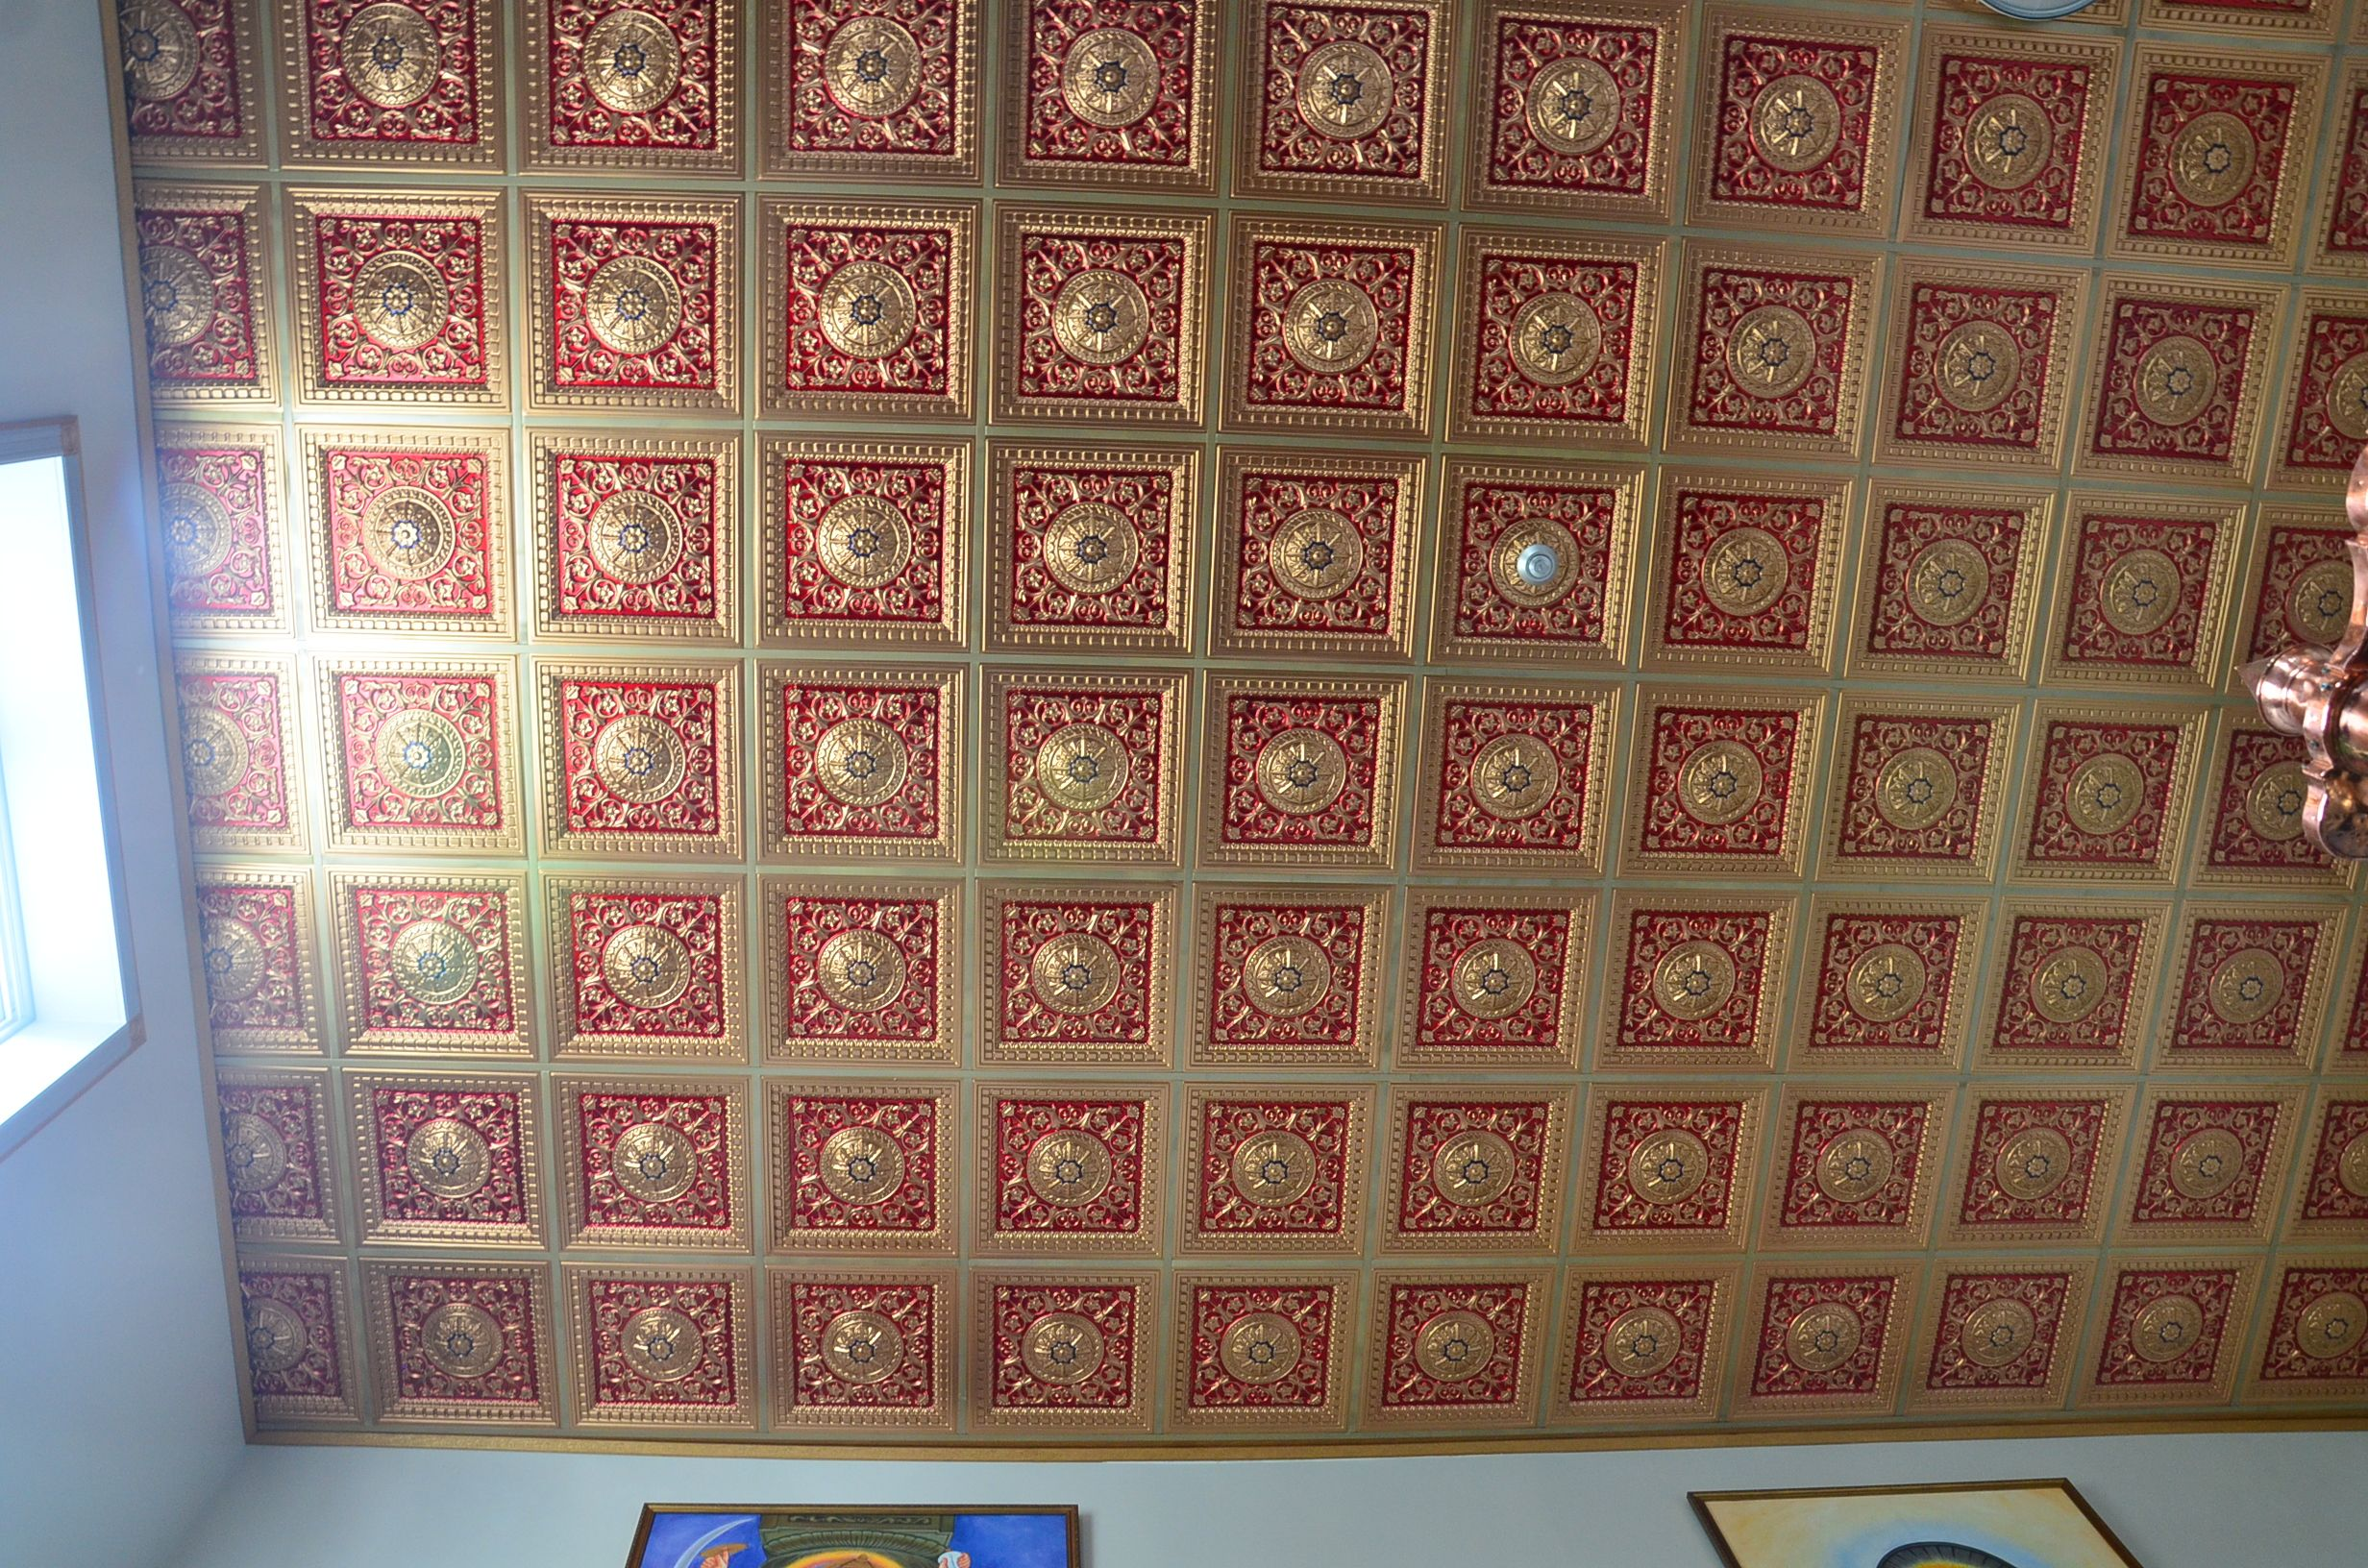 Talissa decor diy pvc faux tin ceiling tile 215 gold red talissa decor diy pvc faux tin ceiling tile 215 gold red royal blue price 1099 size 23 34 x 23 34 httptalissadecorcatalo dailygadgetfo Image collections